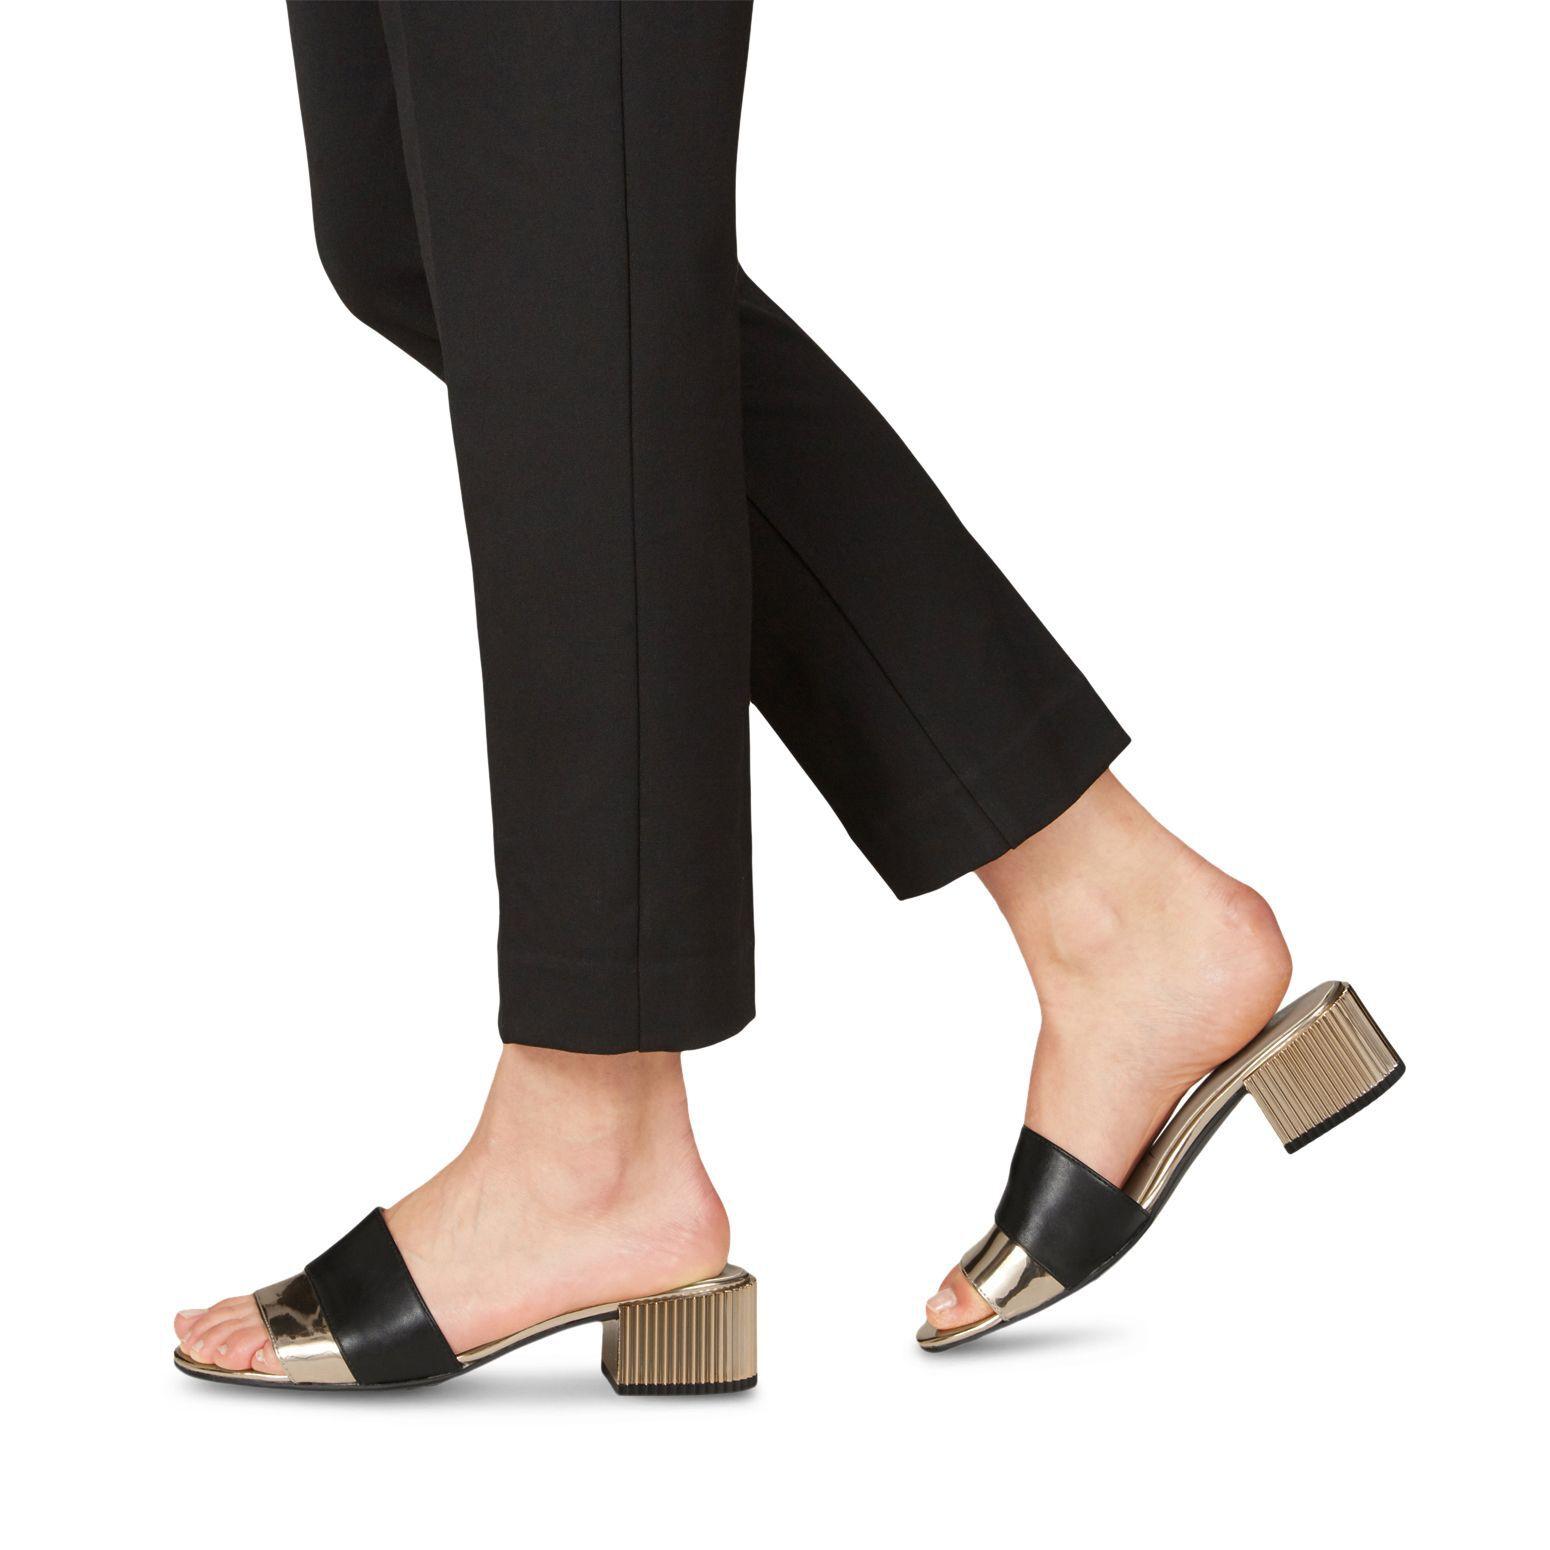 Pantolette 1 1 27232 20: Tamaris Pantoletten online kaufen!